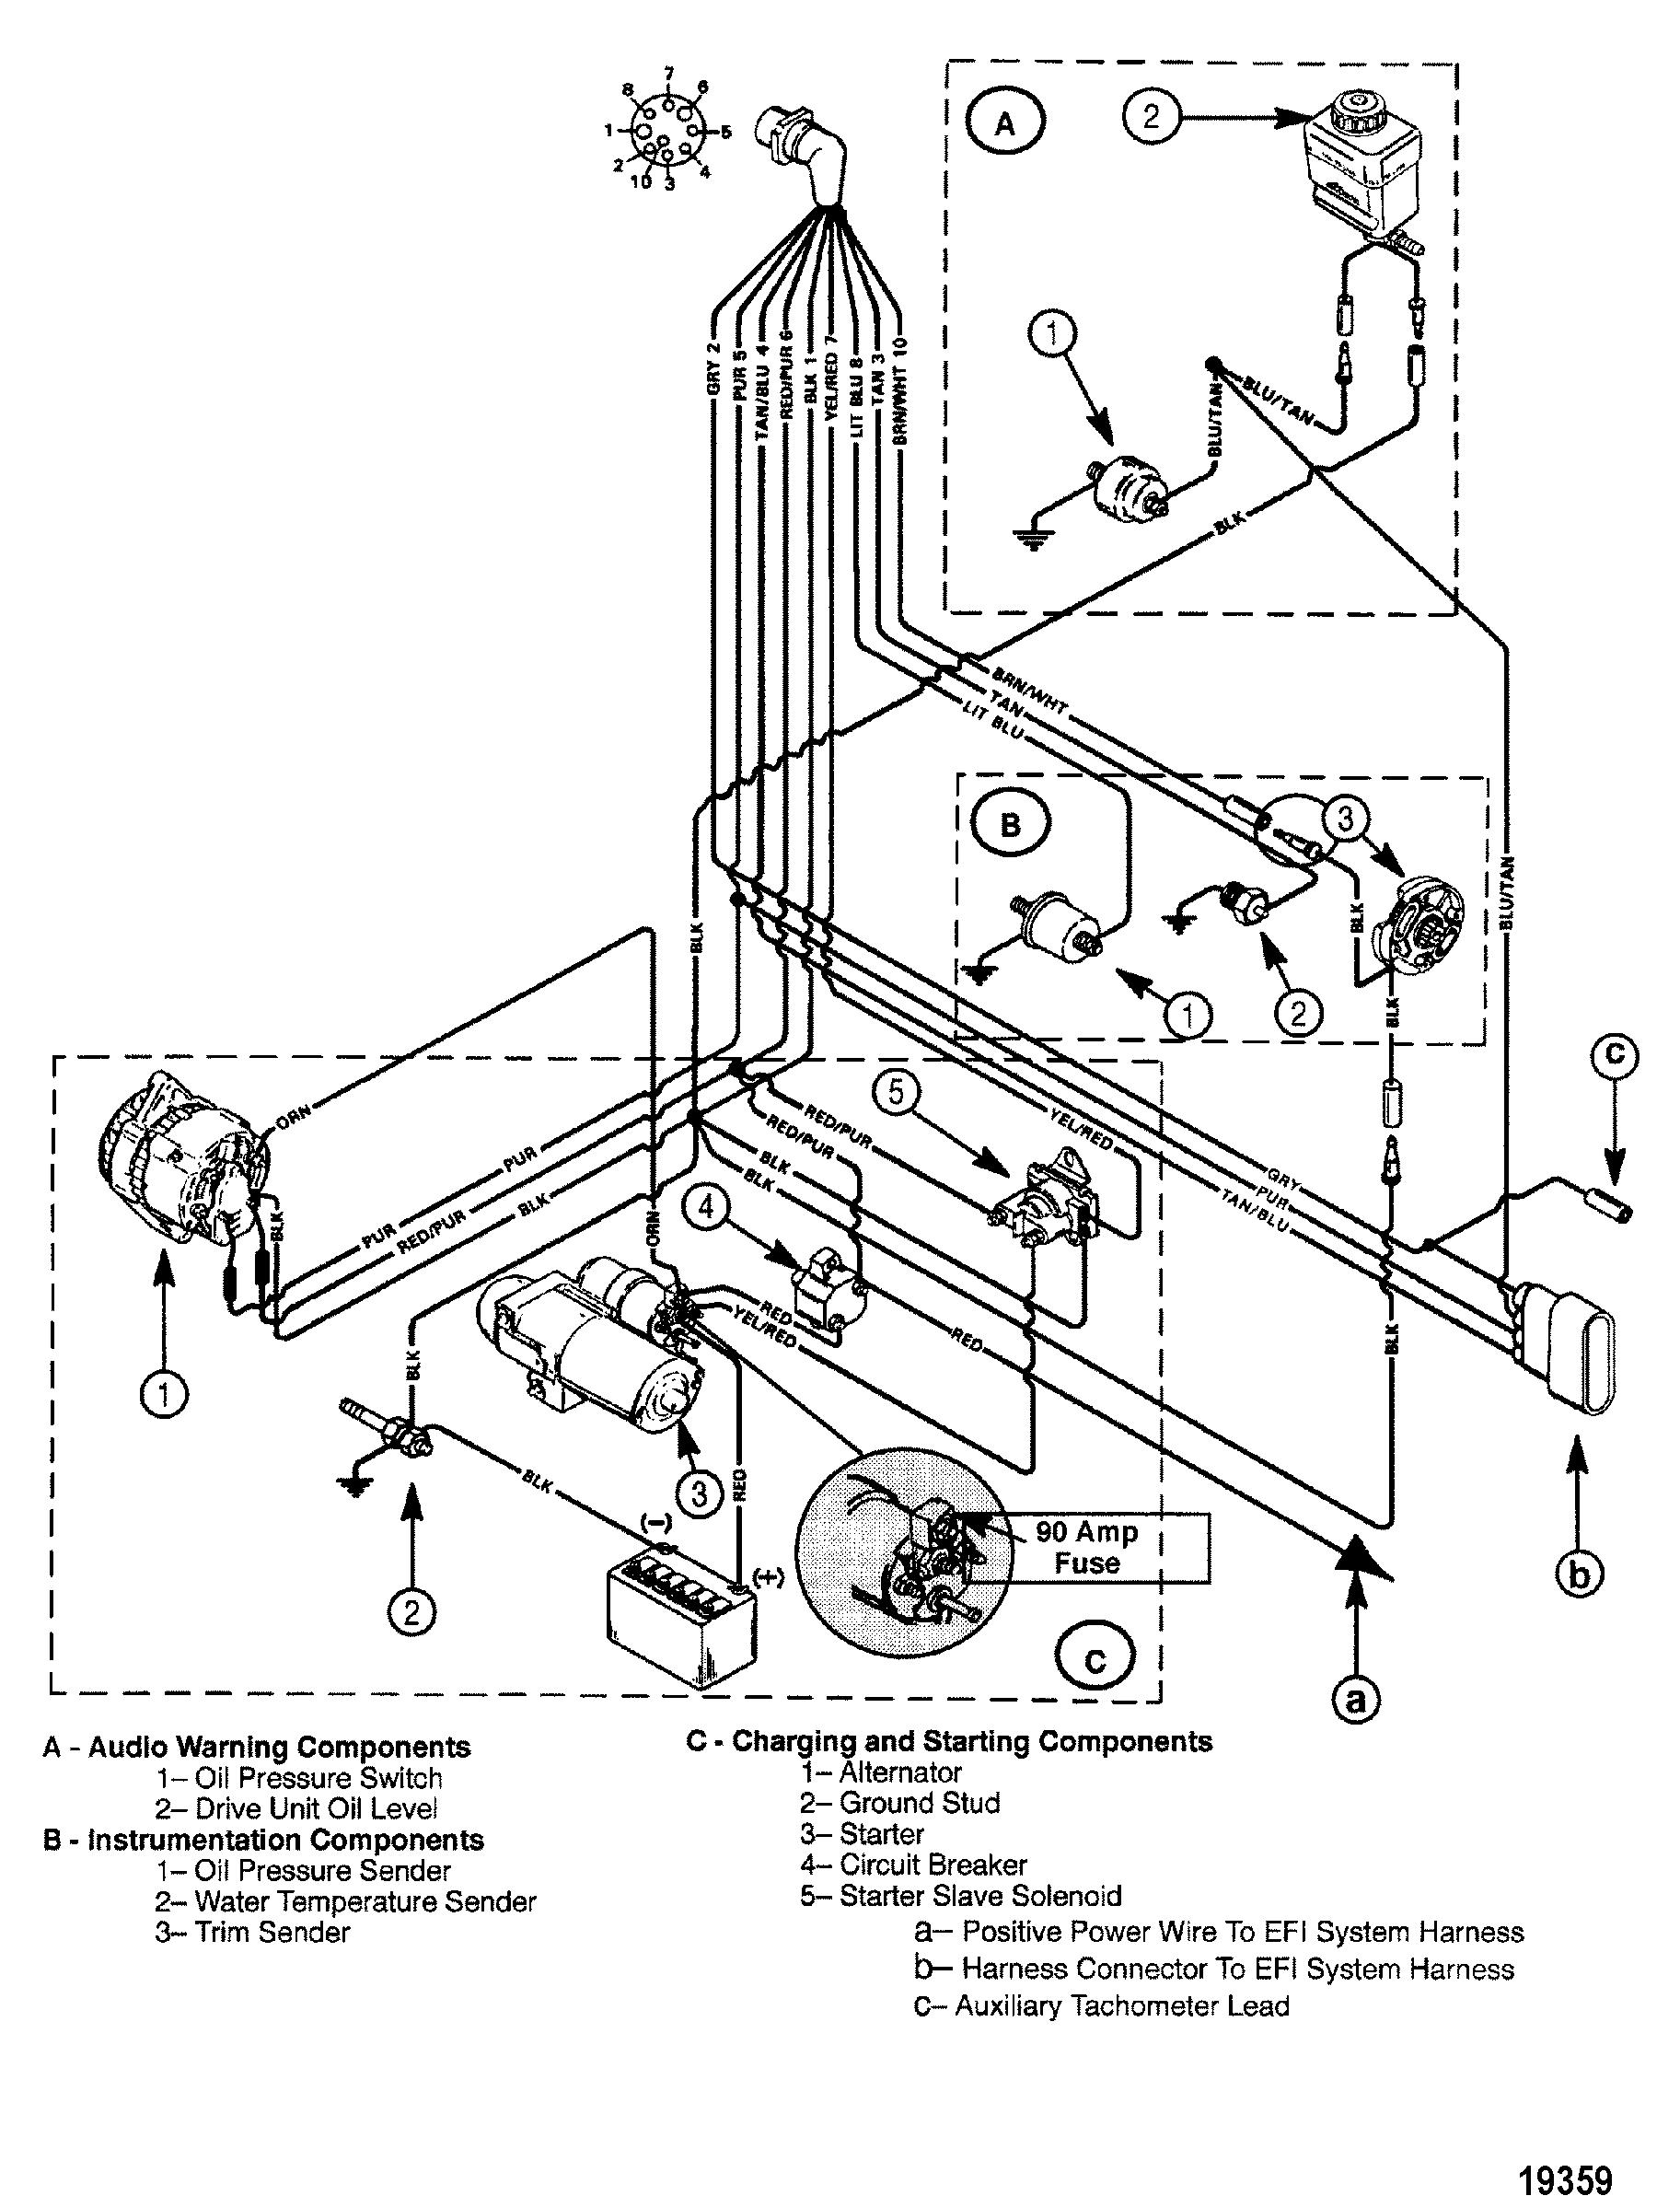 Marine Tachometer Wiring Http Wwwjamestowndistributorscom